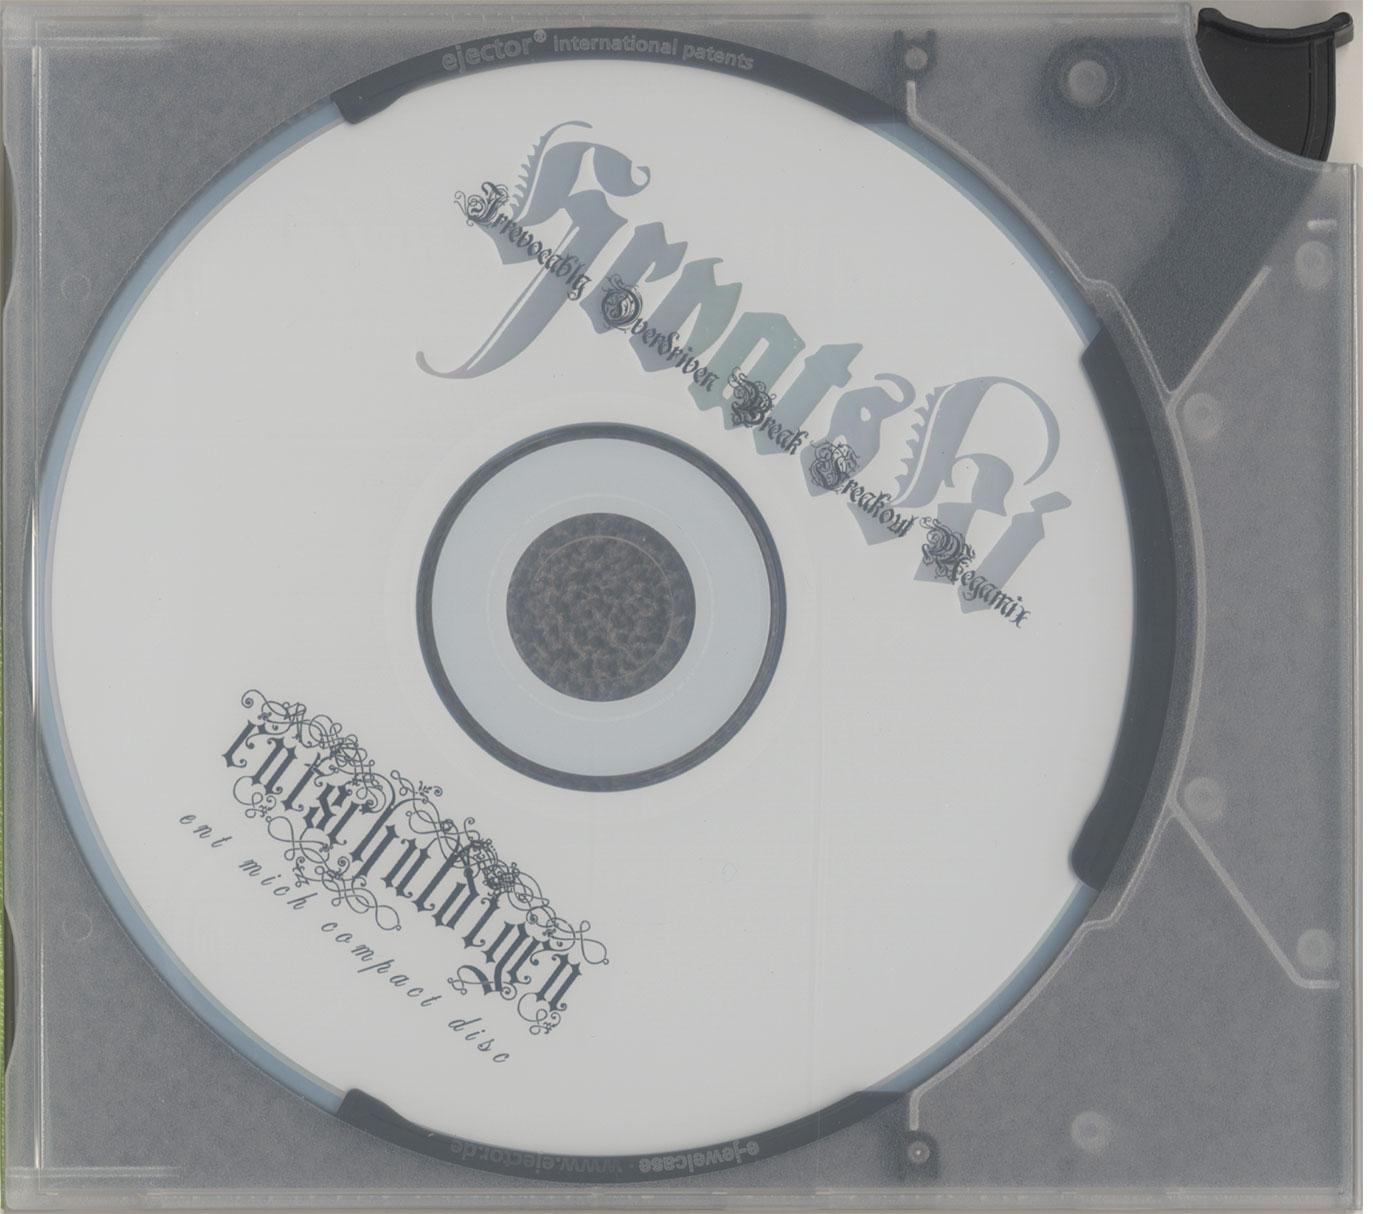 200502.entmich.b.jpg